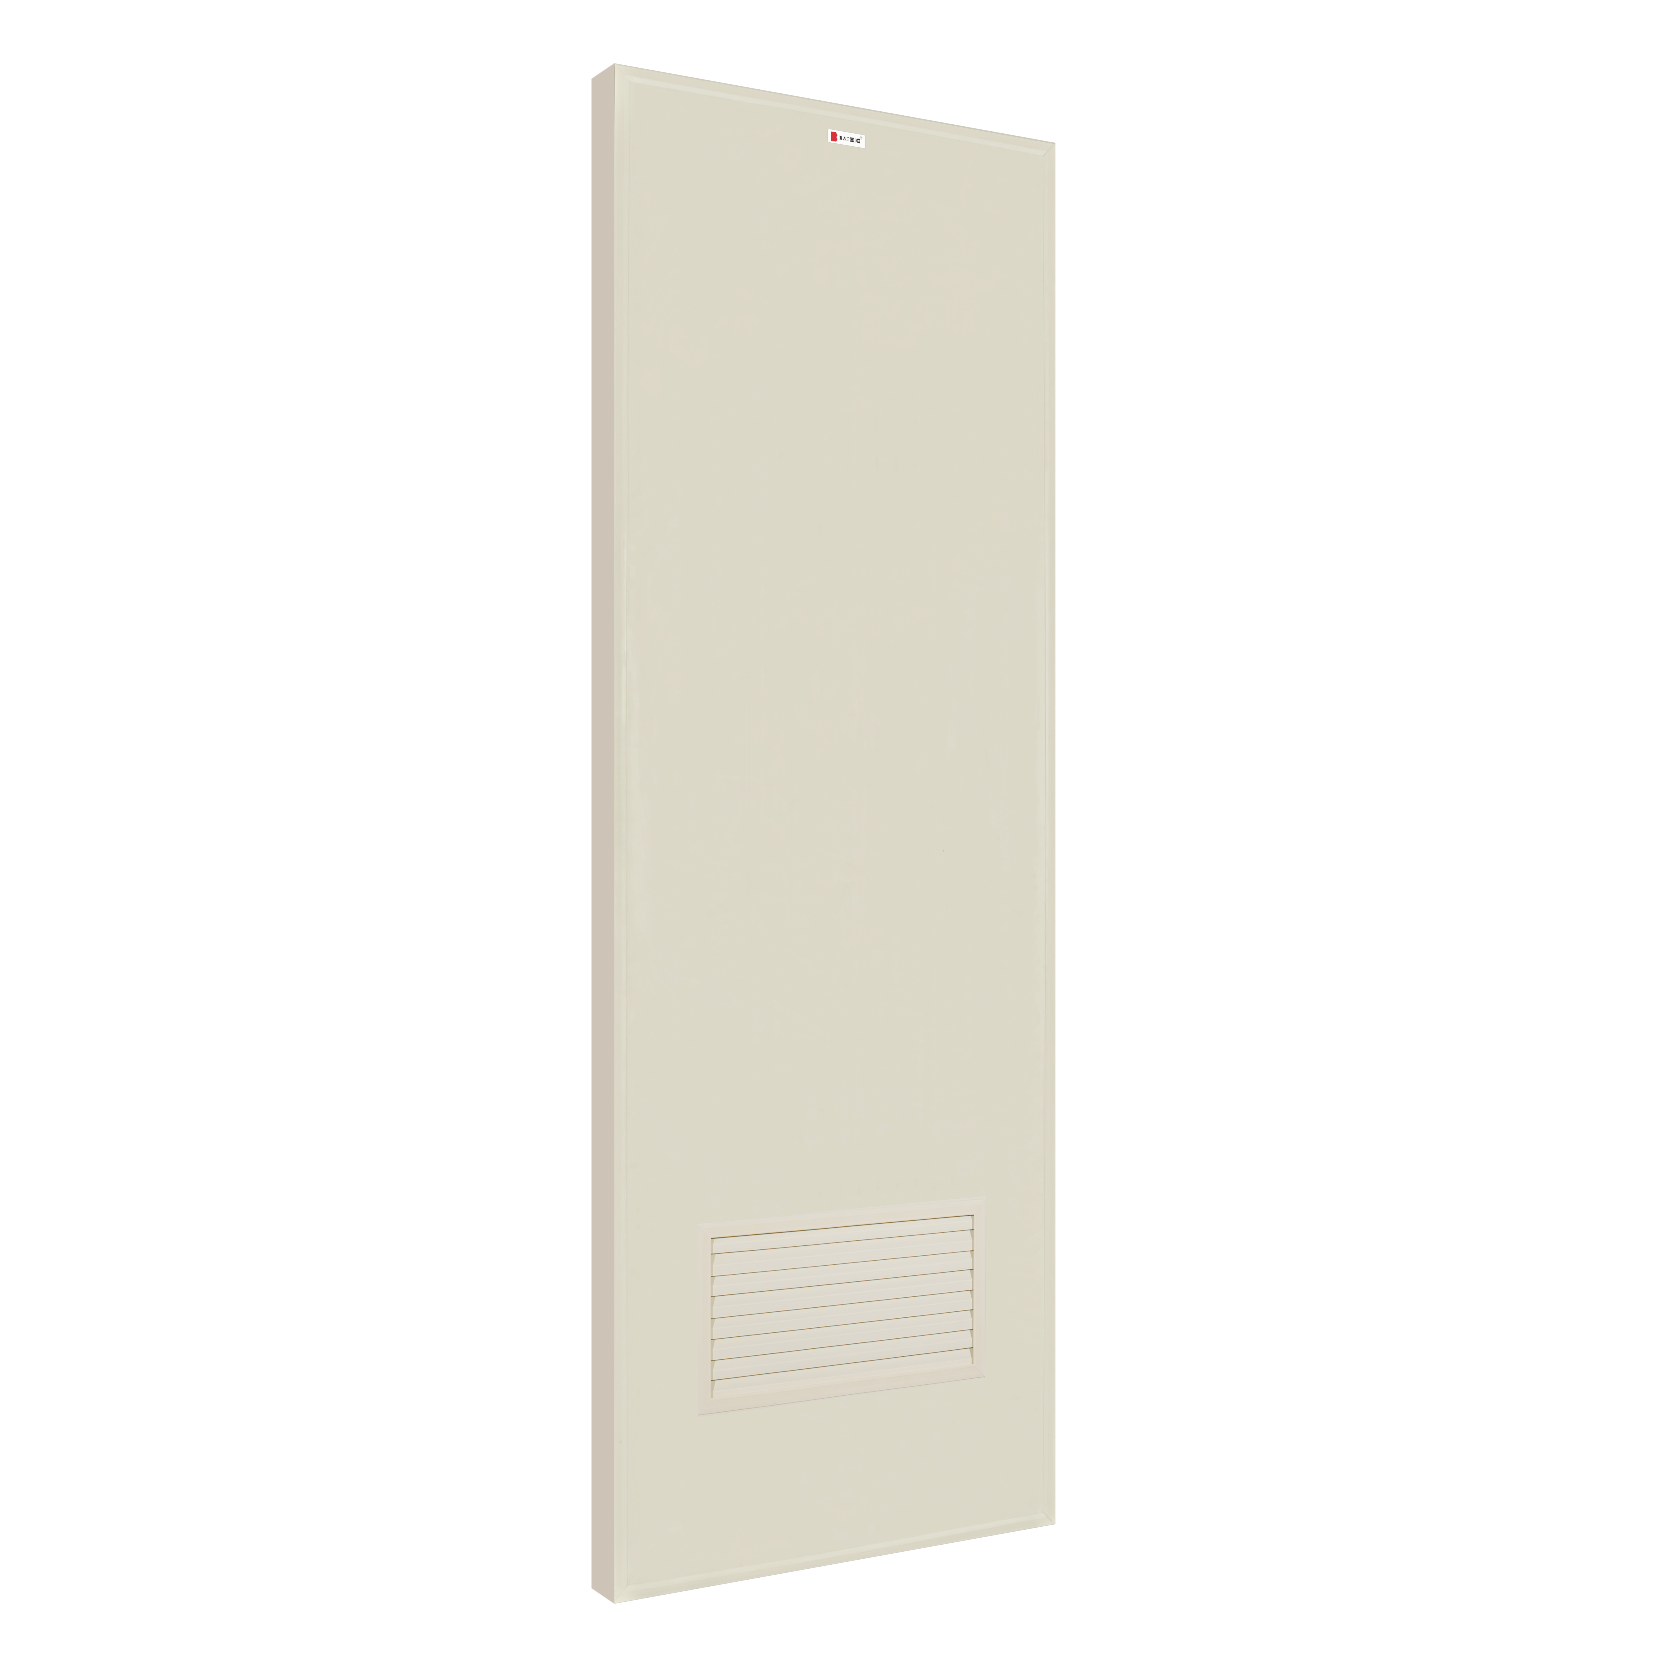 door-pvc-bathic-bpc2-cream-3